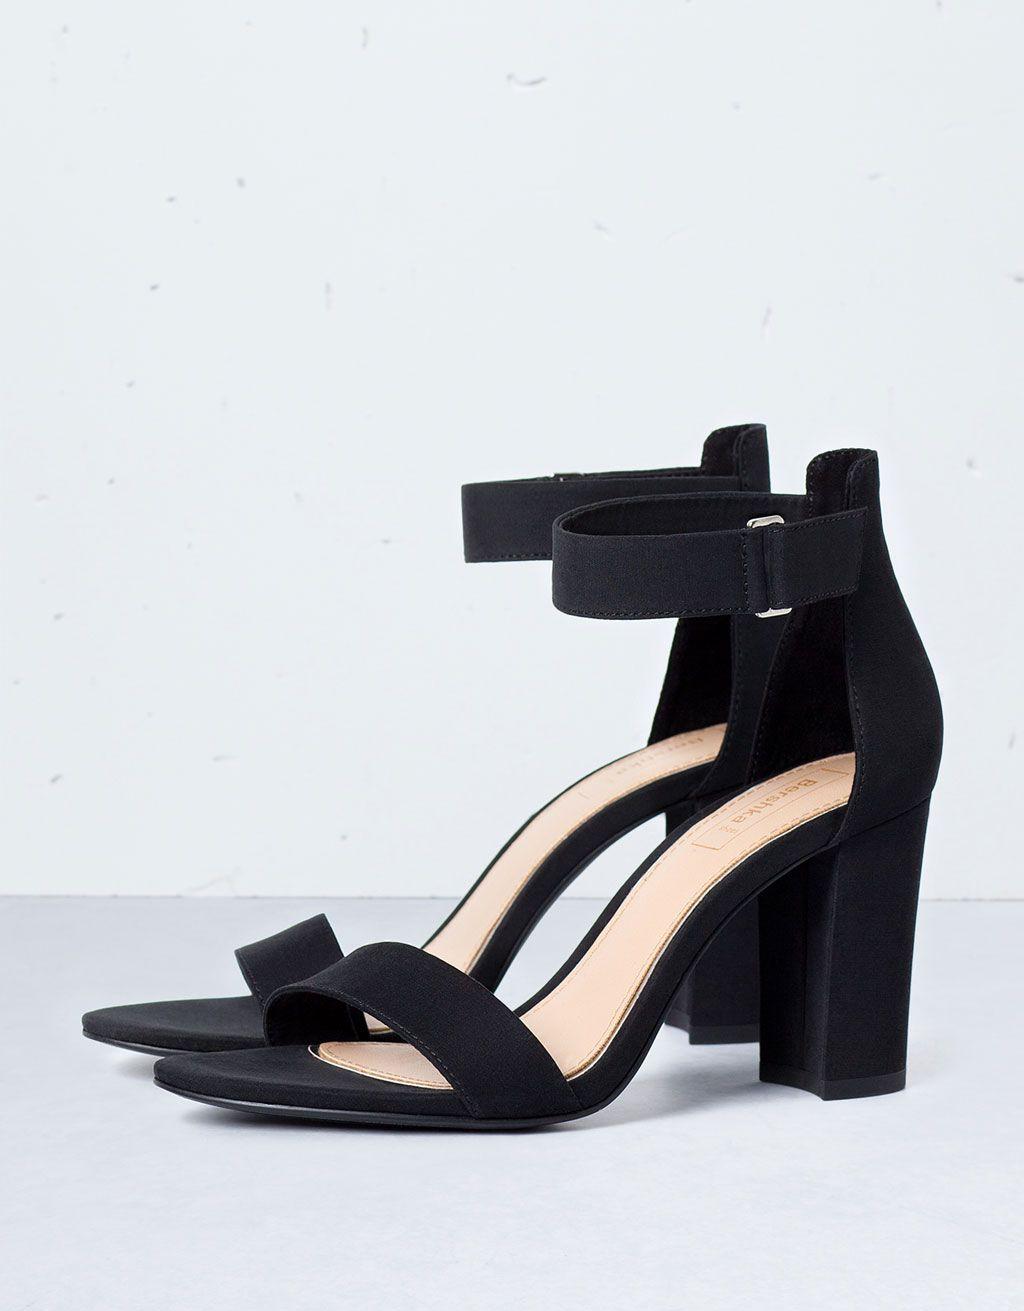 Black sandals ultima online - Bershka Print Sandals With Heels Heeled Sandals Bershka Guatemala